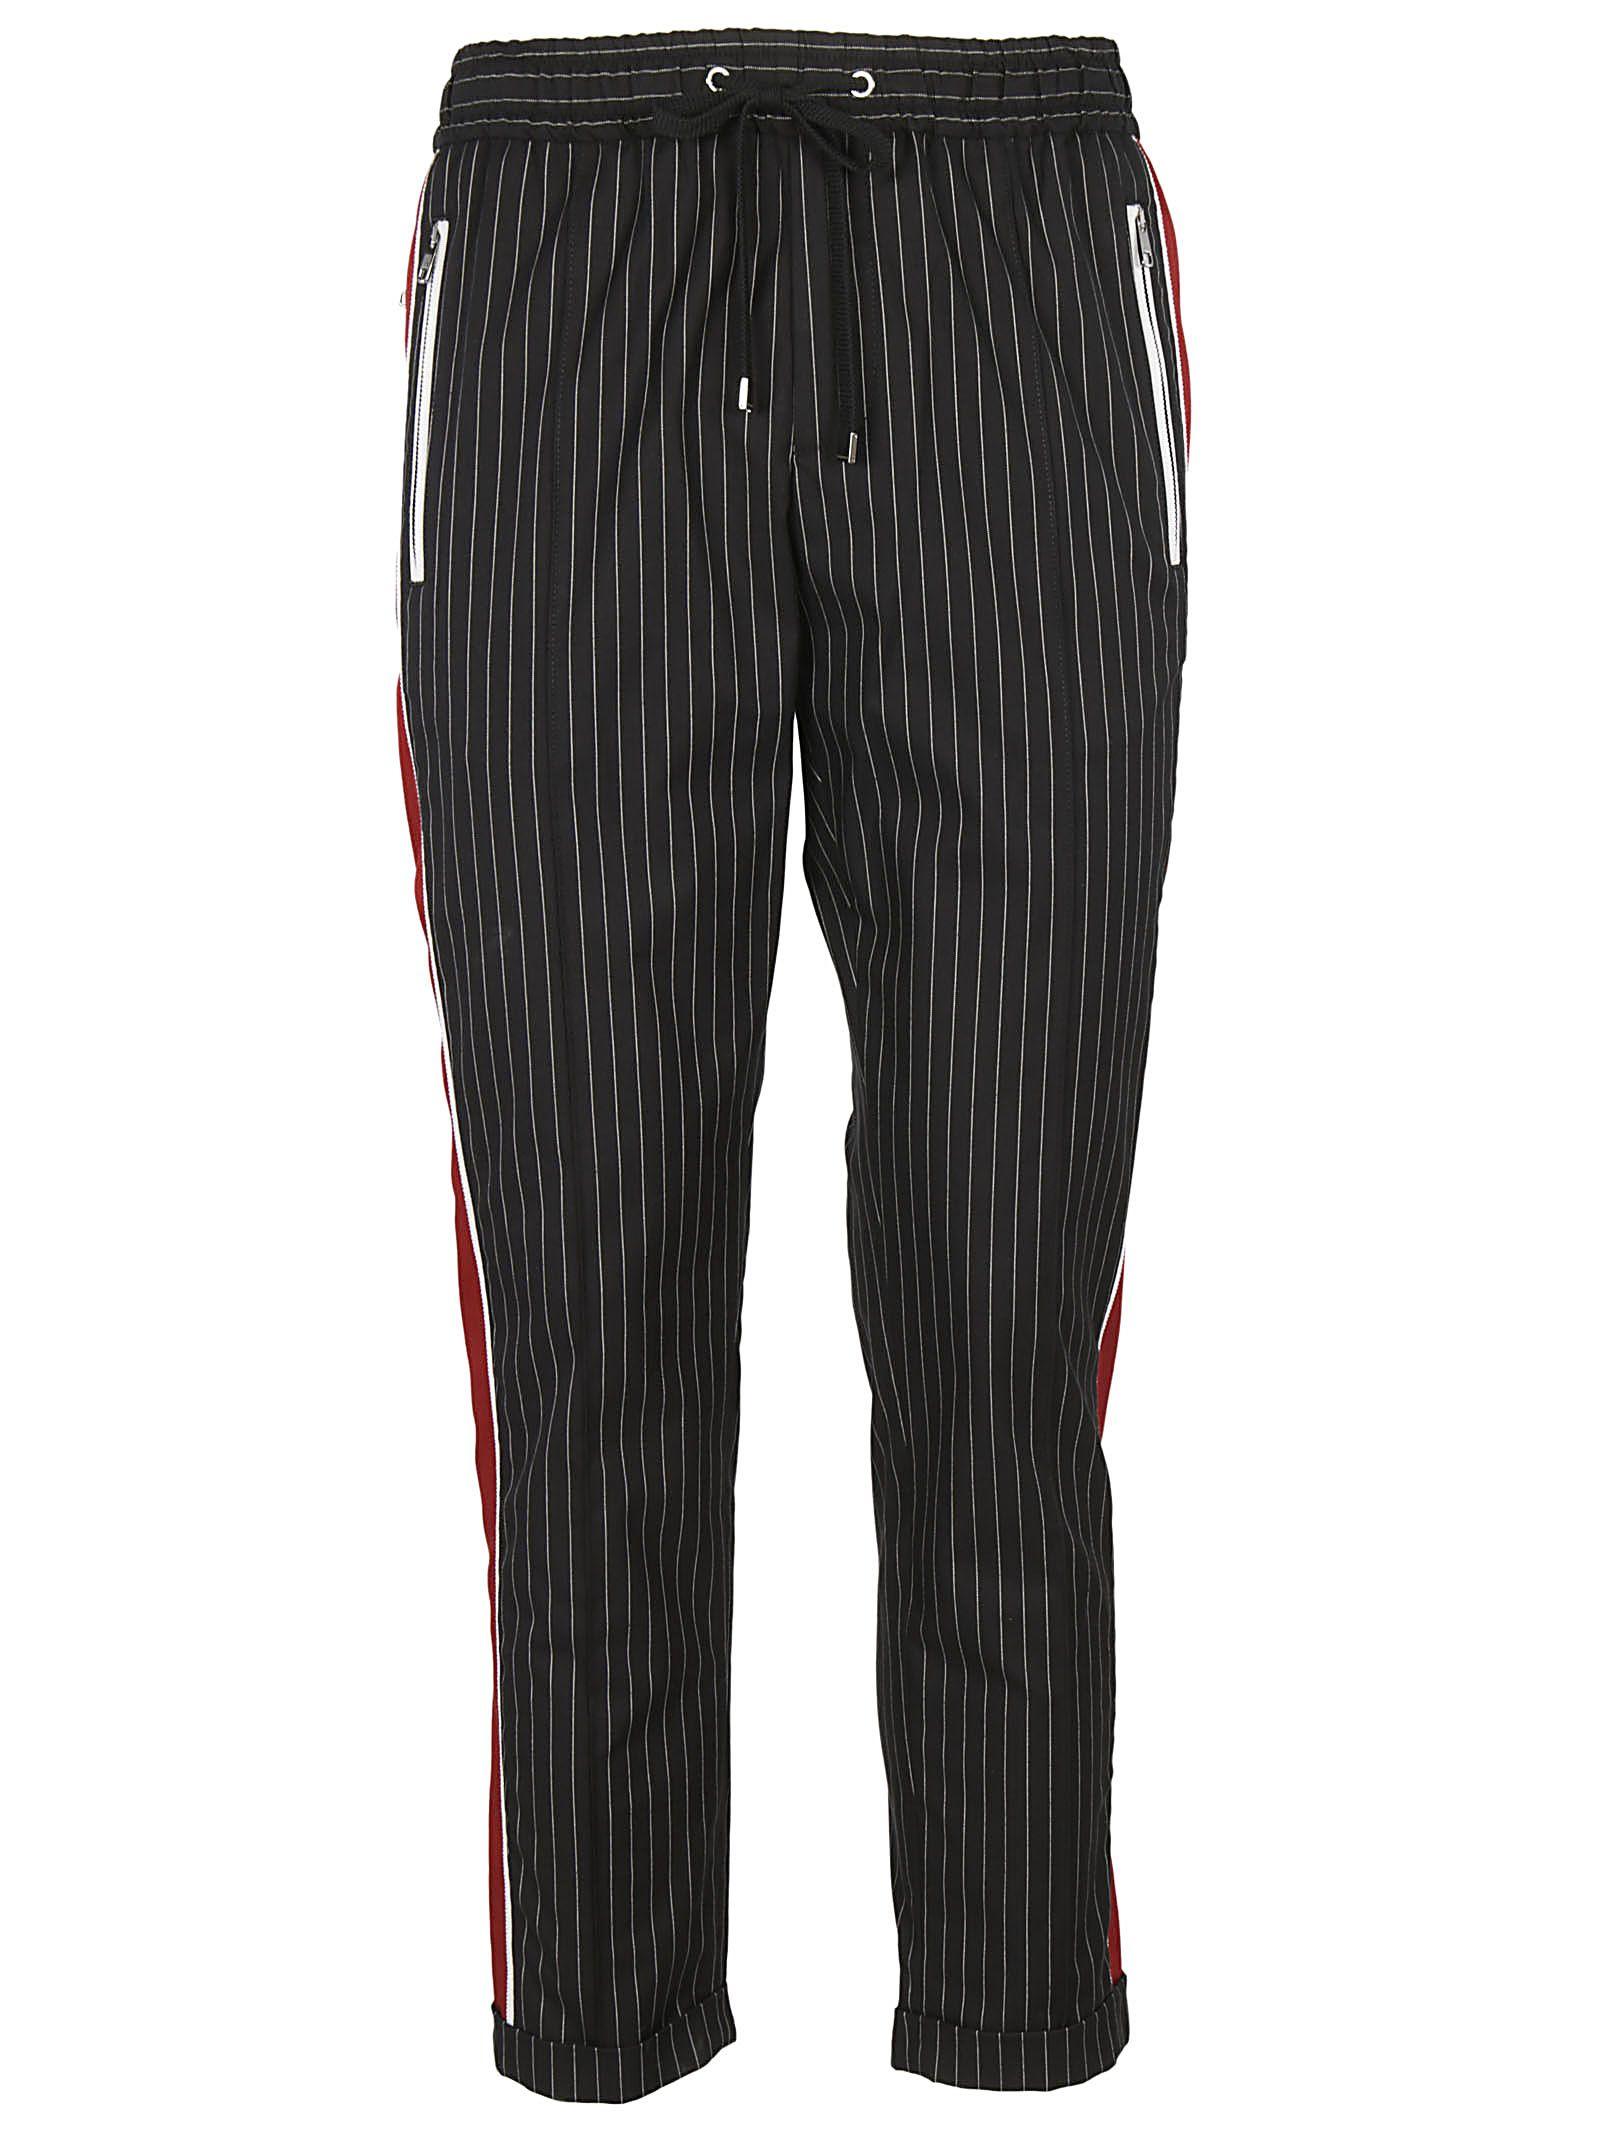 Dolce & Gabbana Pinstriped Track Pants